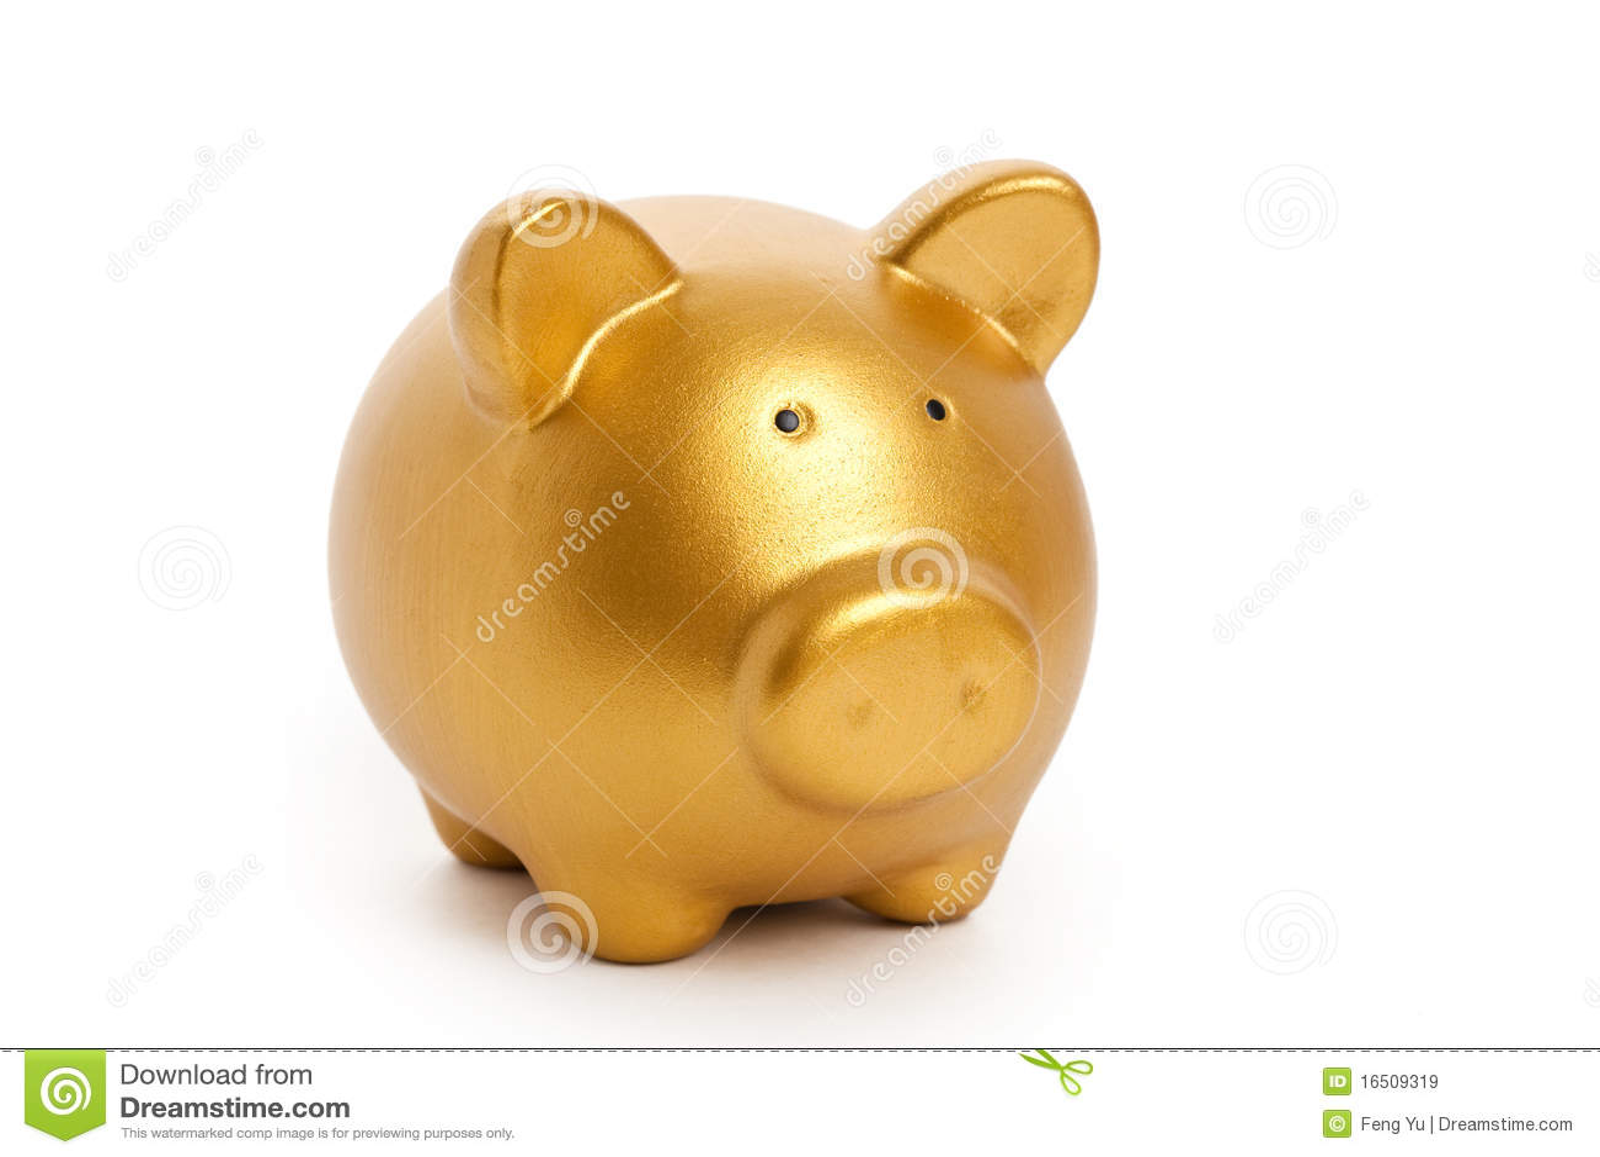 Golden Piggy Bank Stock Image. Image Of Background